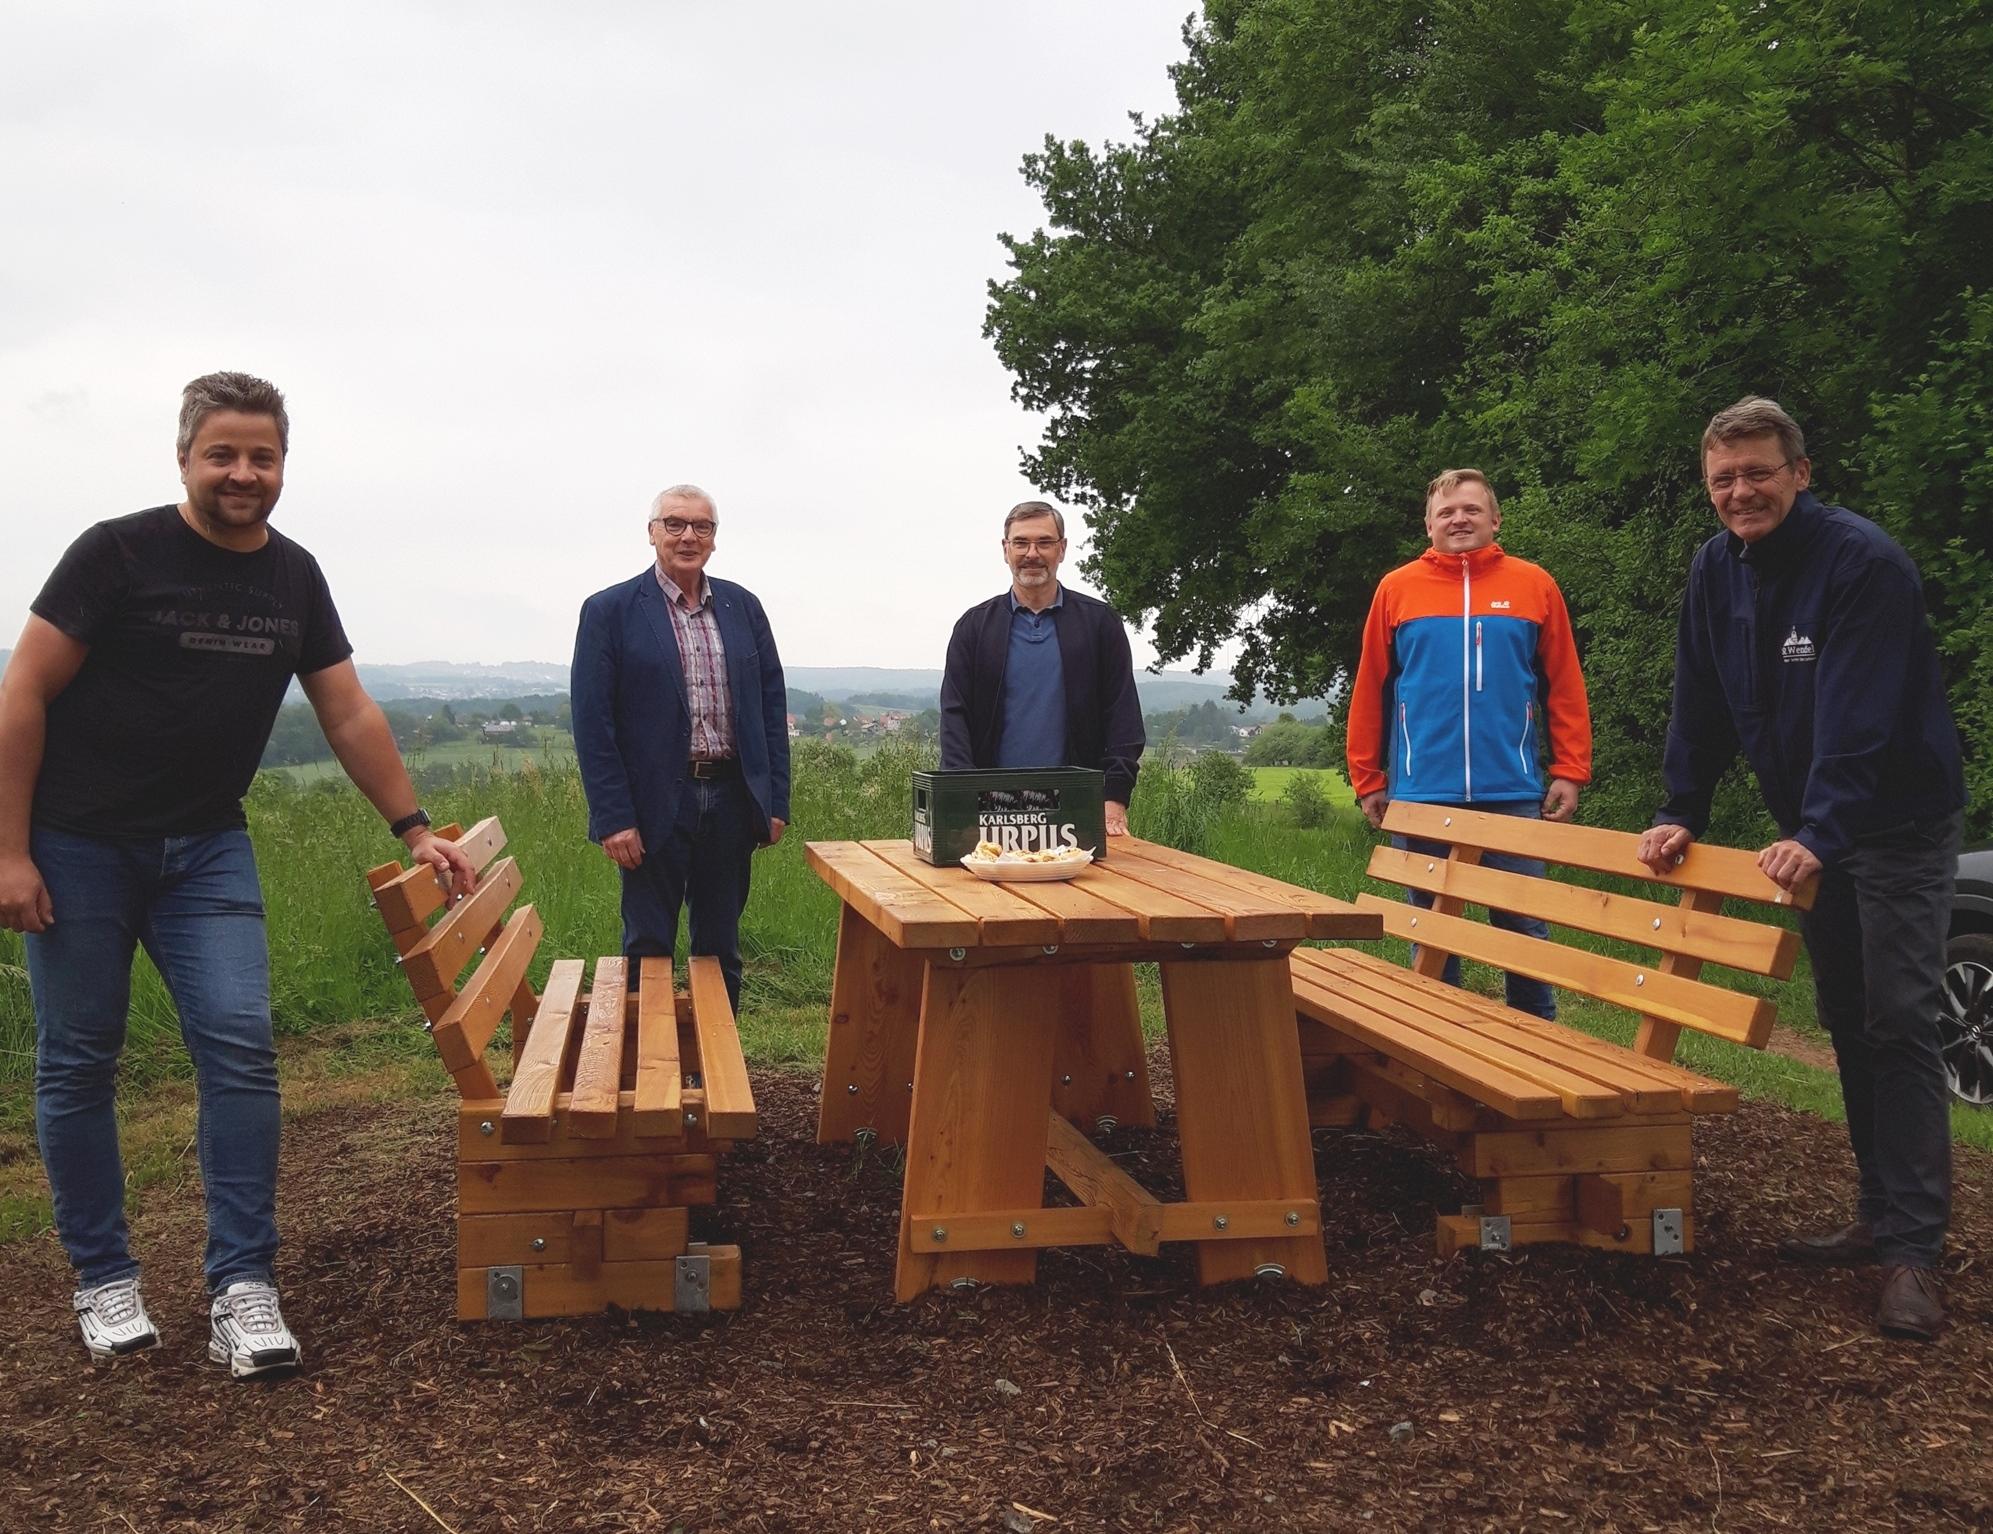 Neue Sitzgruppe am Obstlehrpfad in Winterbach